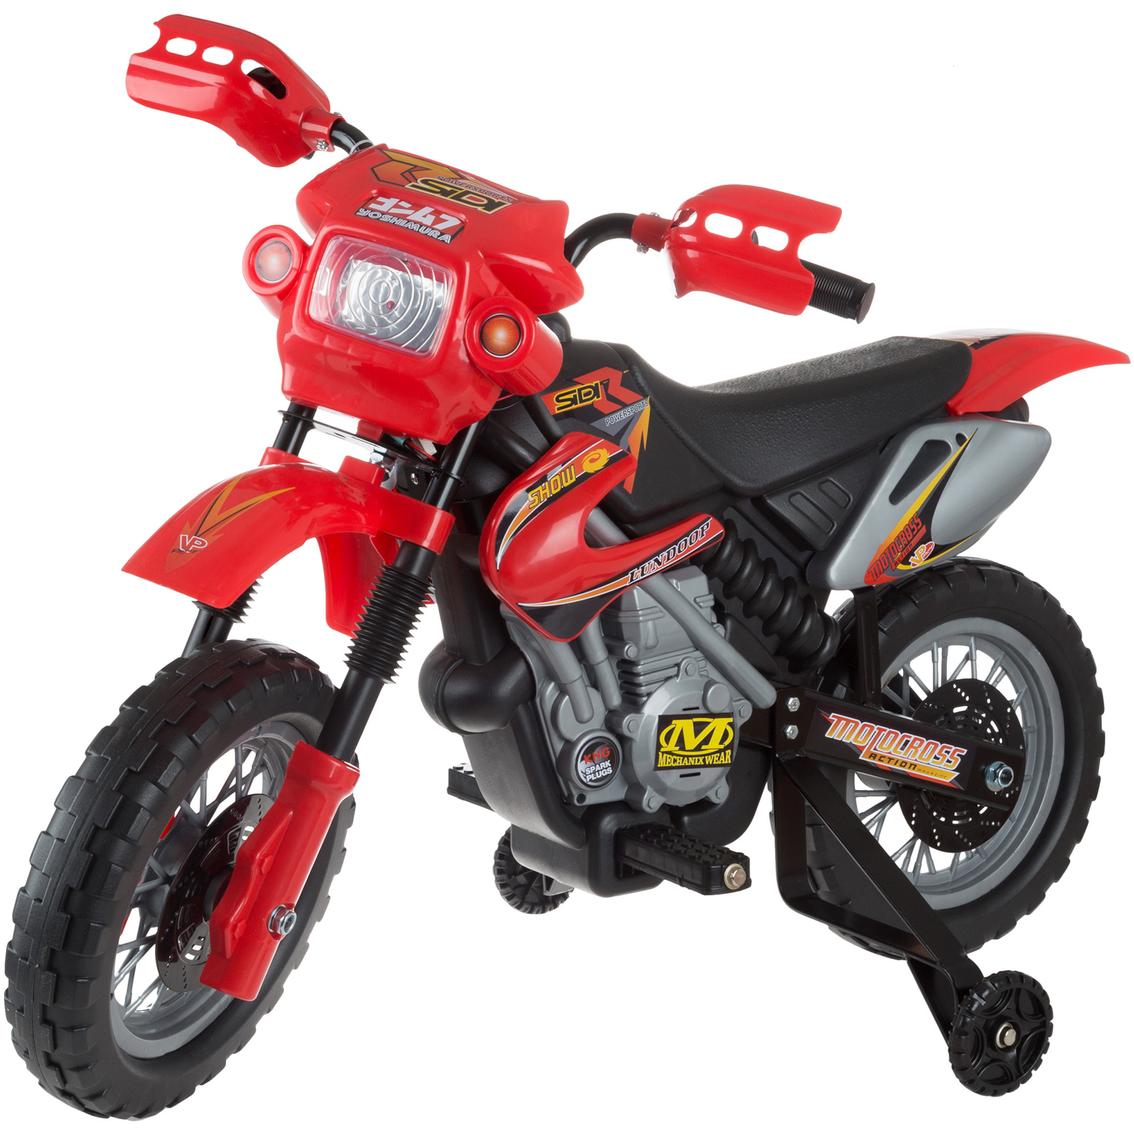 Biker Tote Shoulder Bag Statement Shopper Birthday Gift Funny Cool Motorcycle